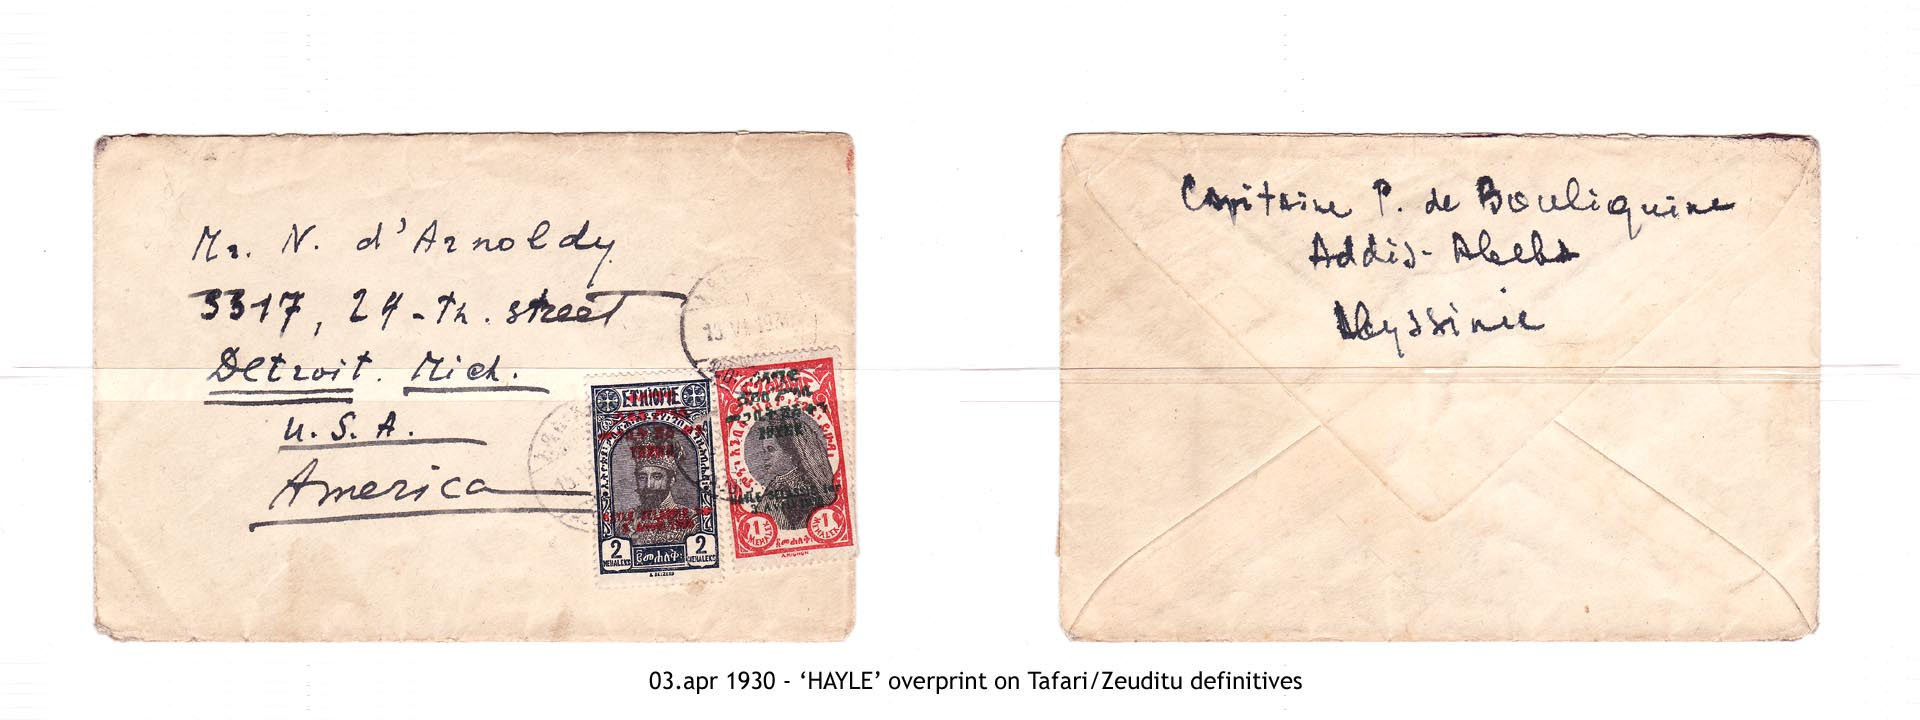 19300403 - 'HAYLE' overprint on Tafari-Zeuditu definitives